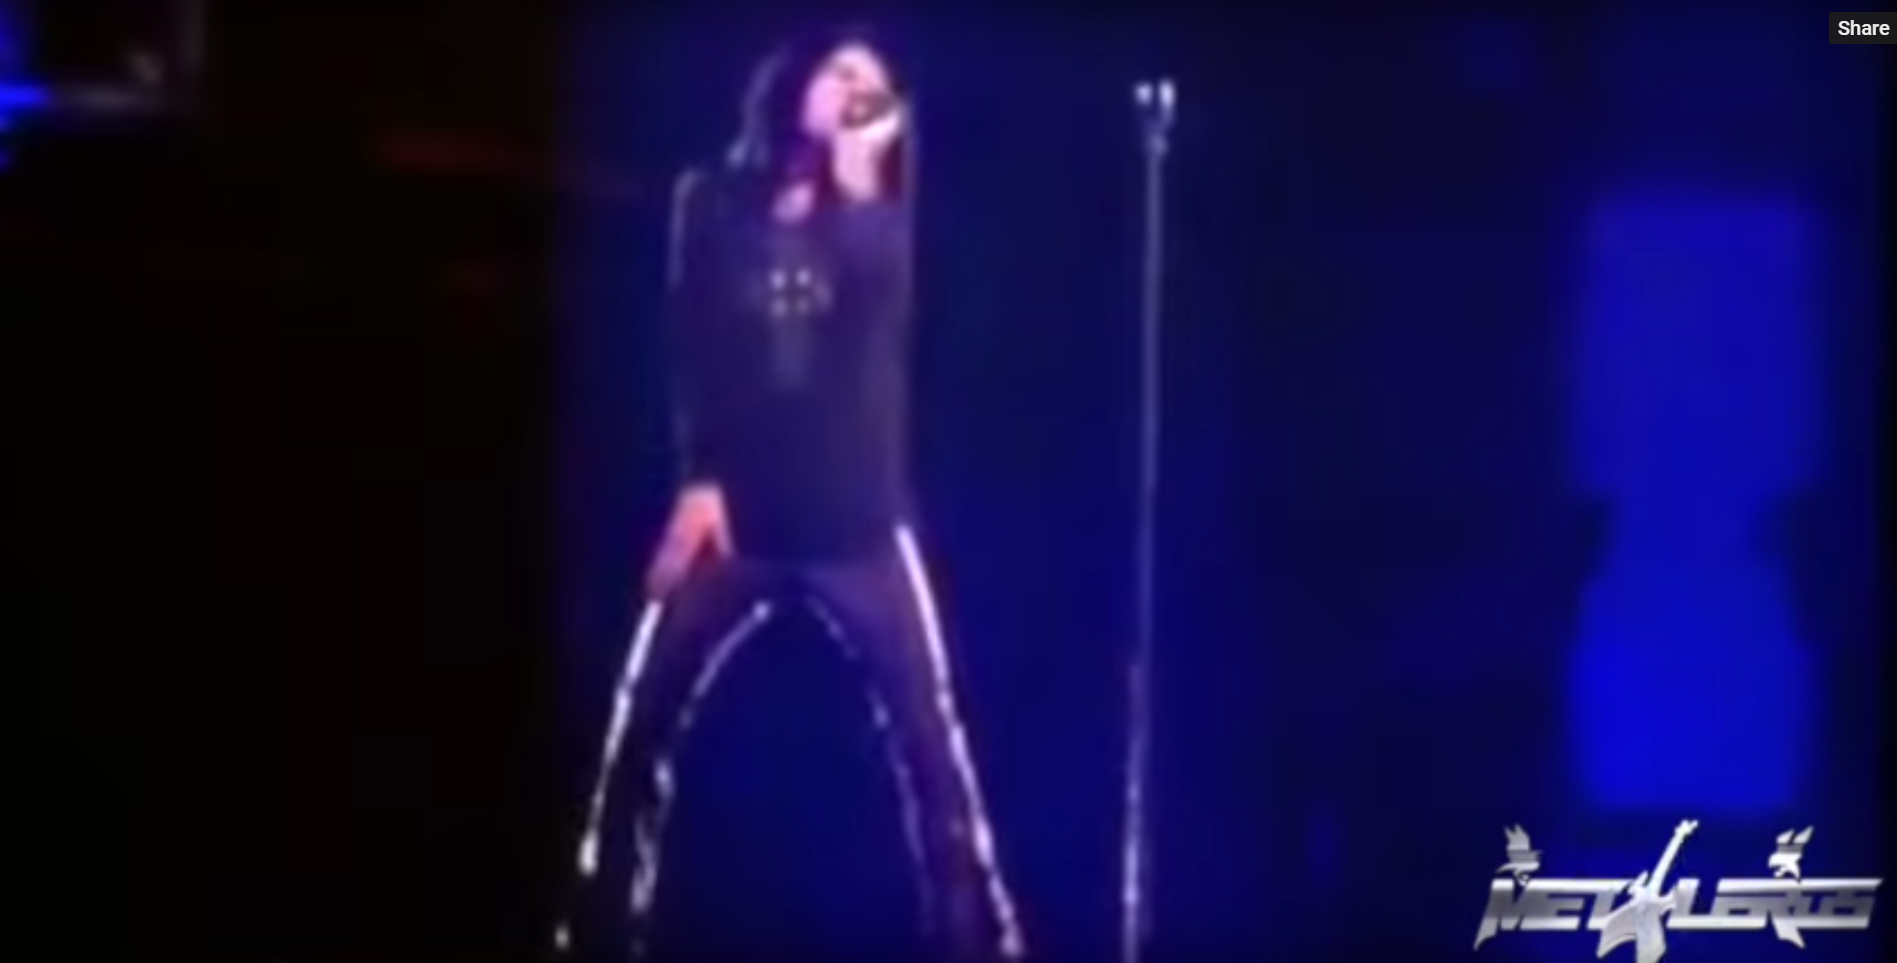 2017-ben turnéra indul a halott Ronnie James Dio hologramja